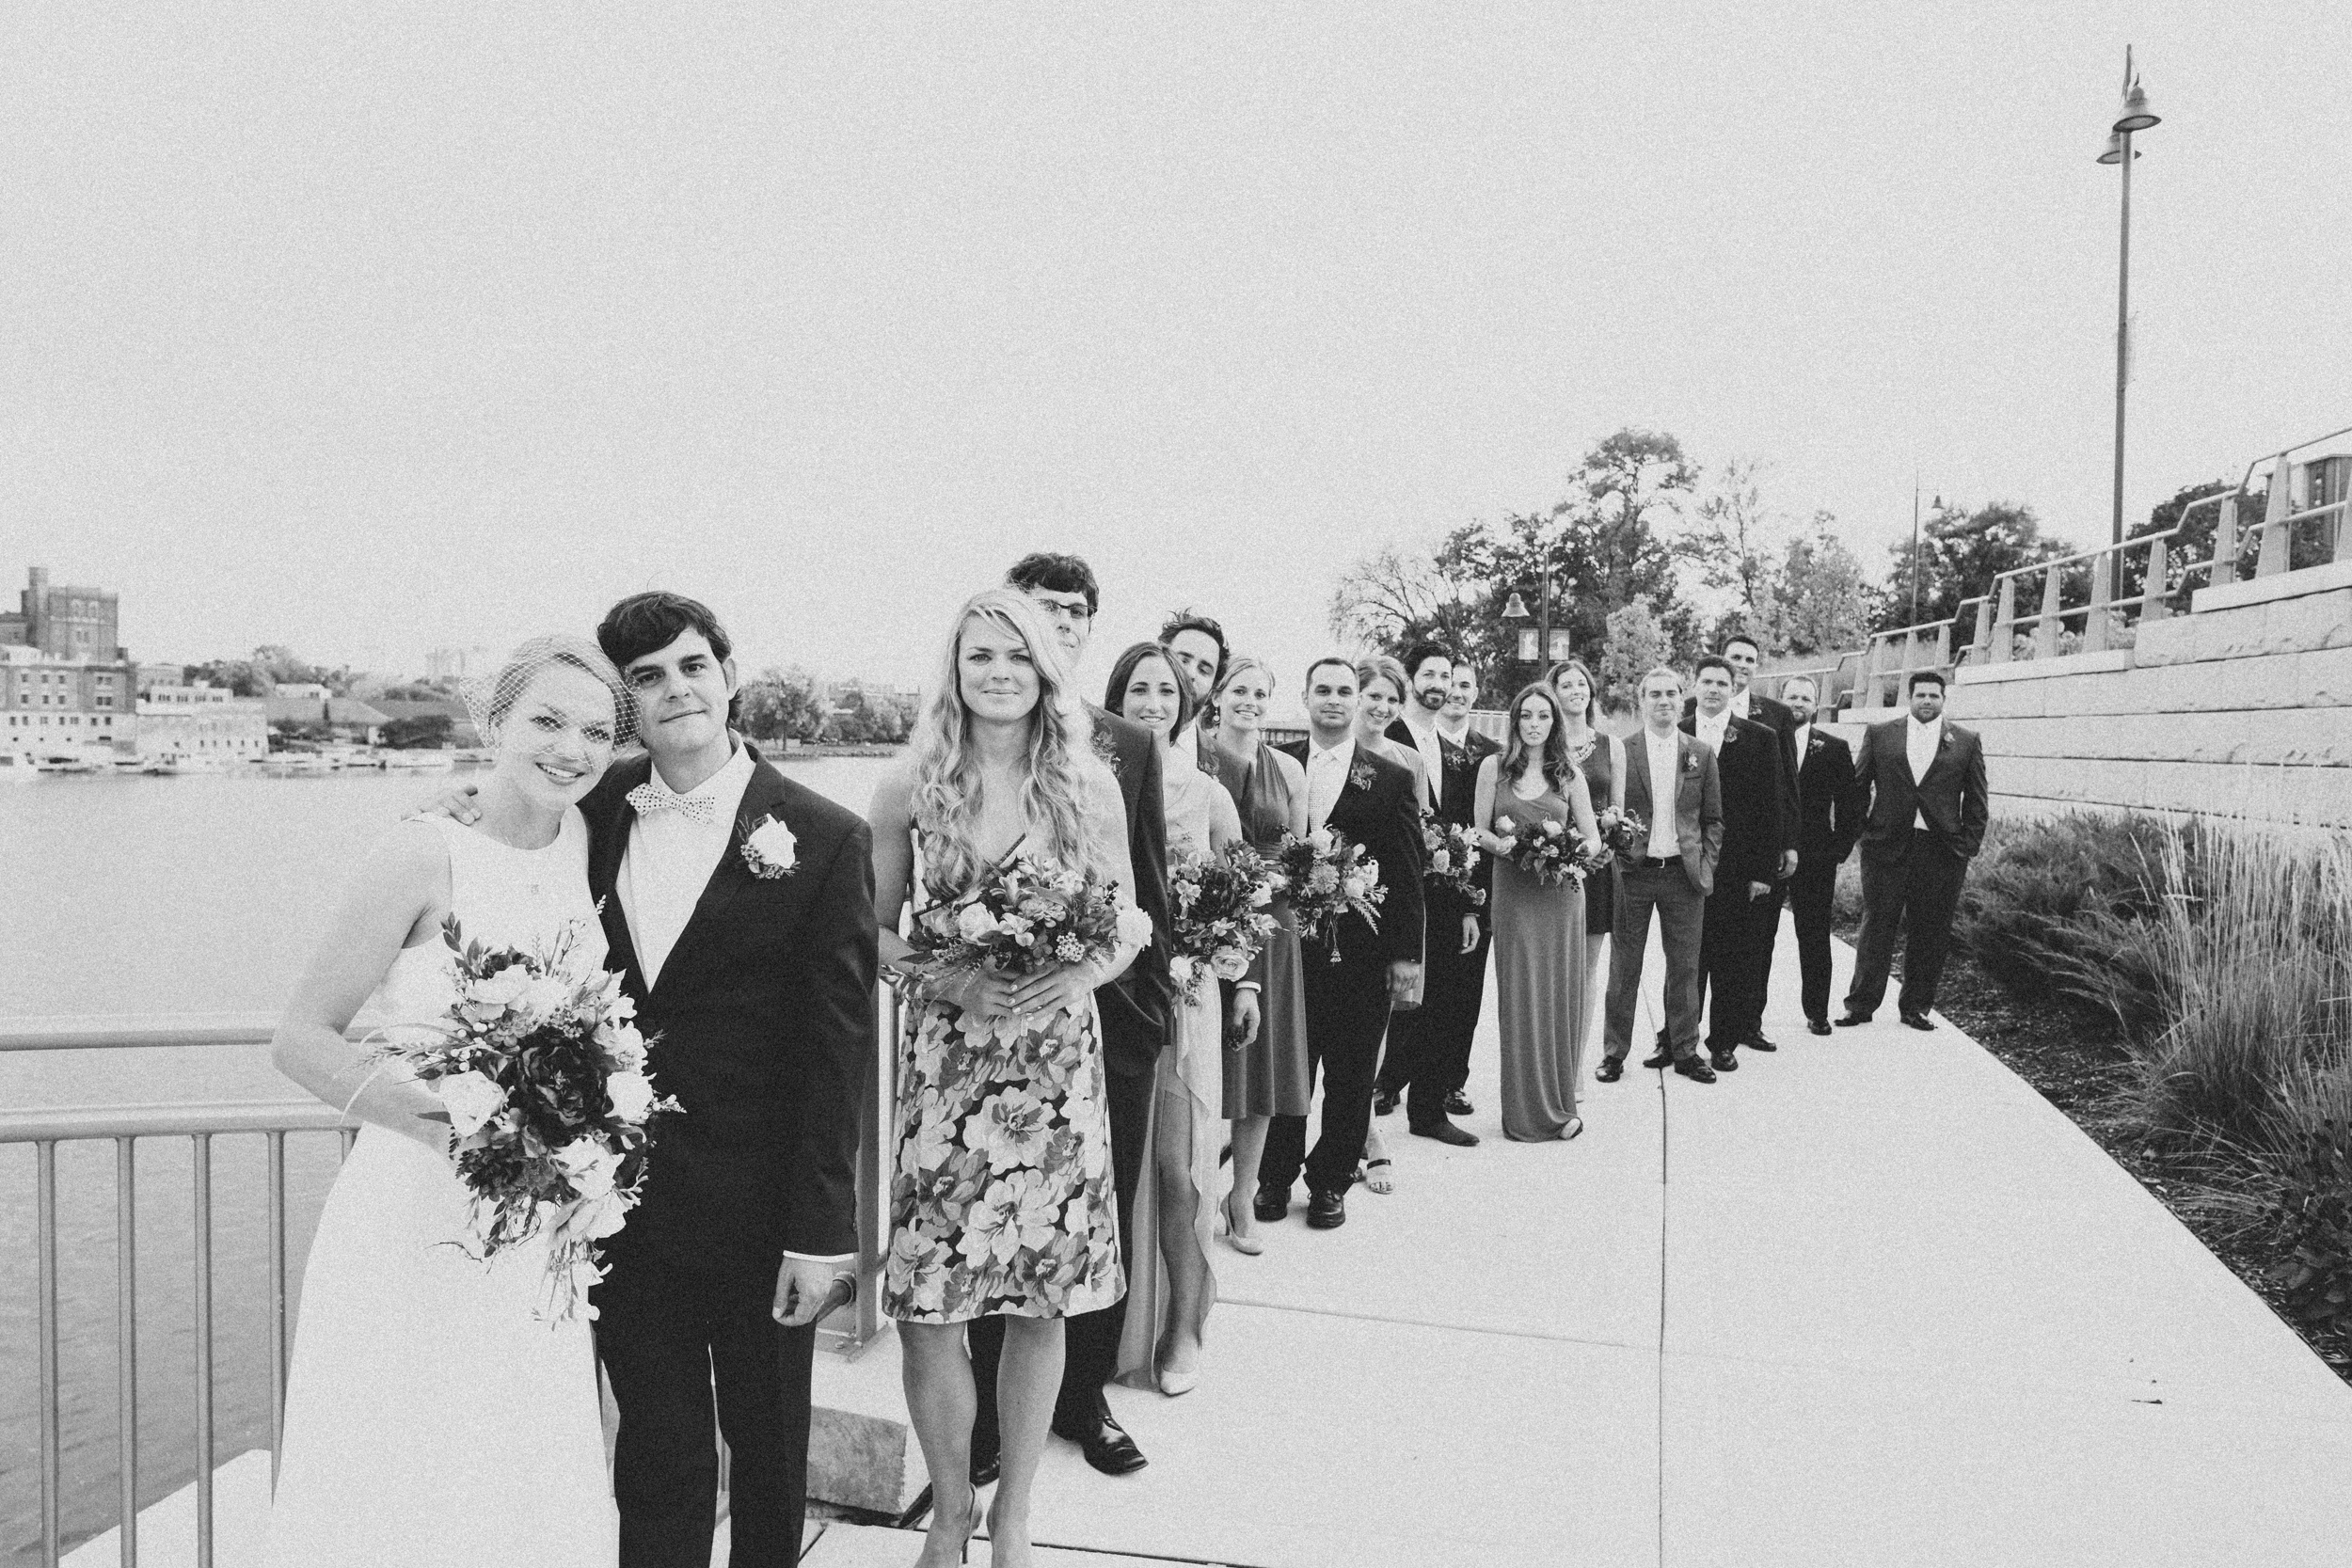 10-05-2013 maggie & adam wedding photography by brian milo-146.jpg